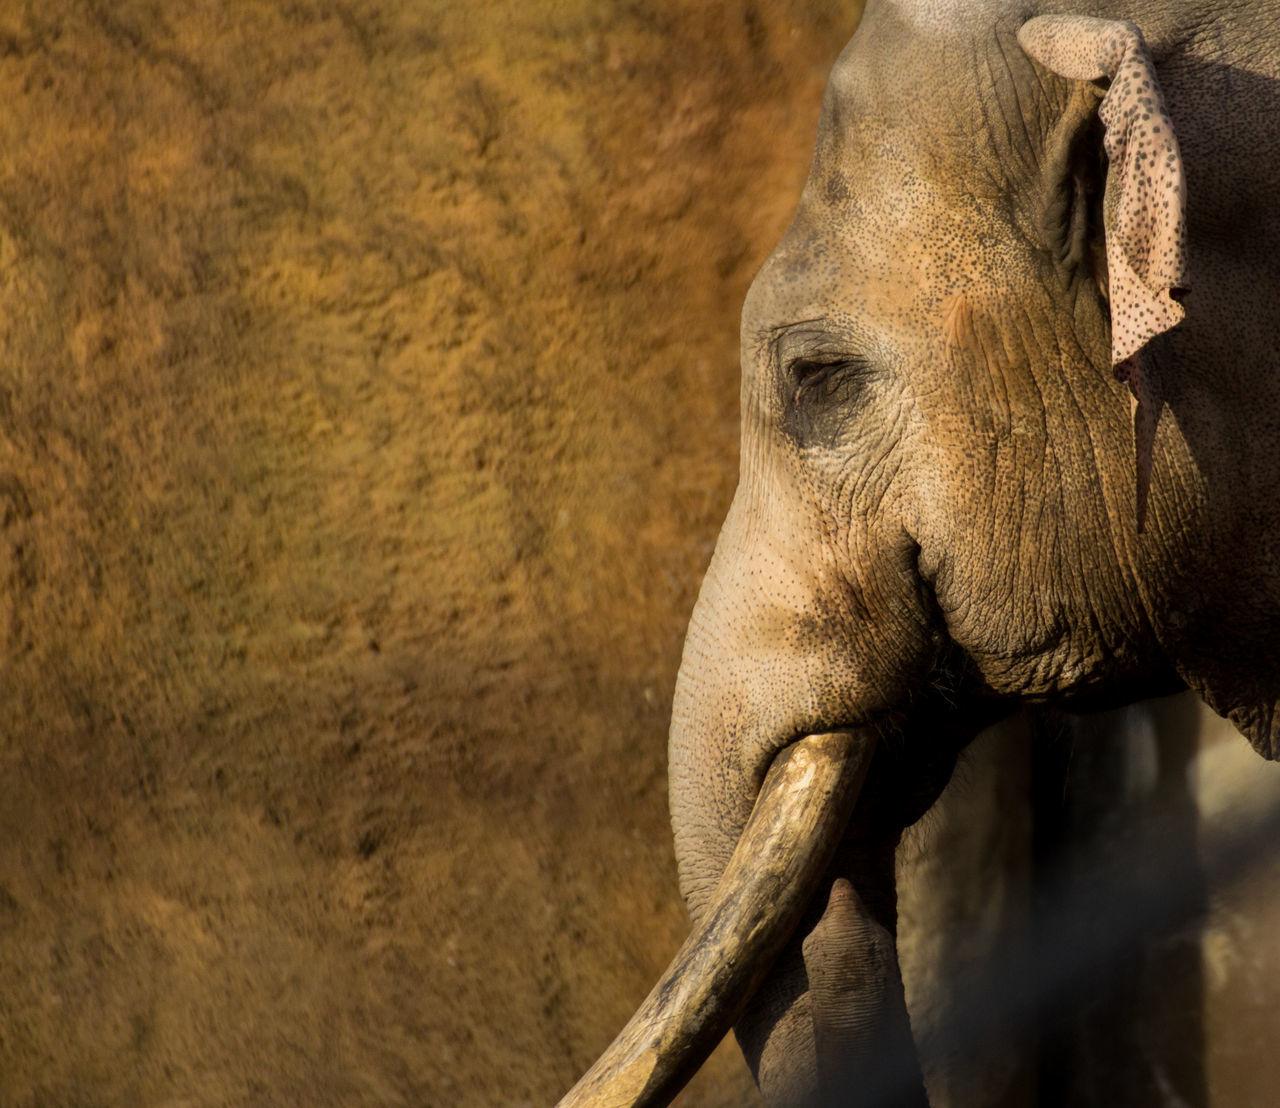 Animal Themes Animal Wildlife Animals In The Wild Close-up Day Elephant Mammal Nature No People One Animal Outdoors Rhinoceros Safari Animals Tusk